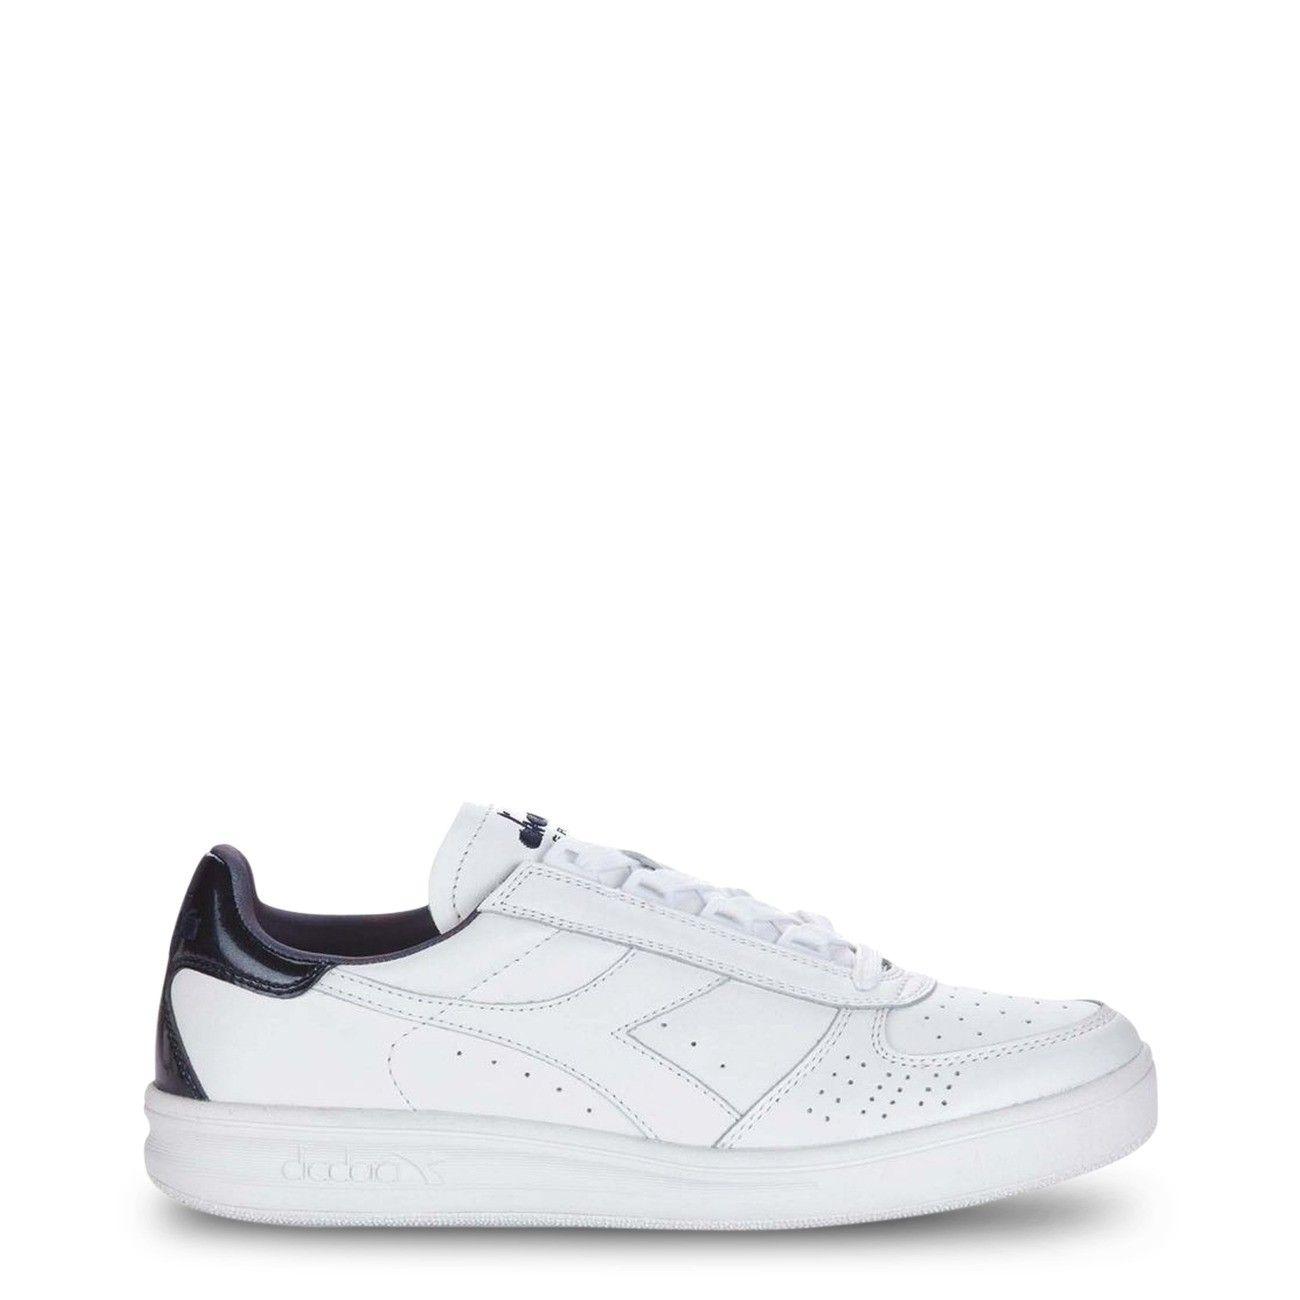 118 99 Diadora Heritage B Elite Liquid Sneakers Size